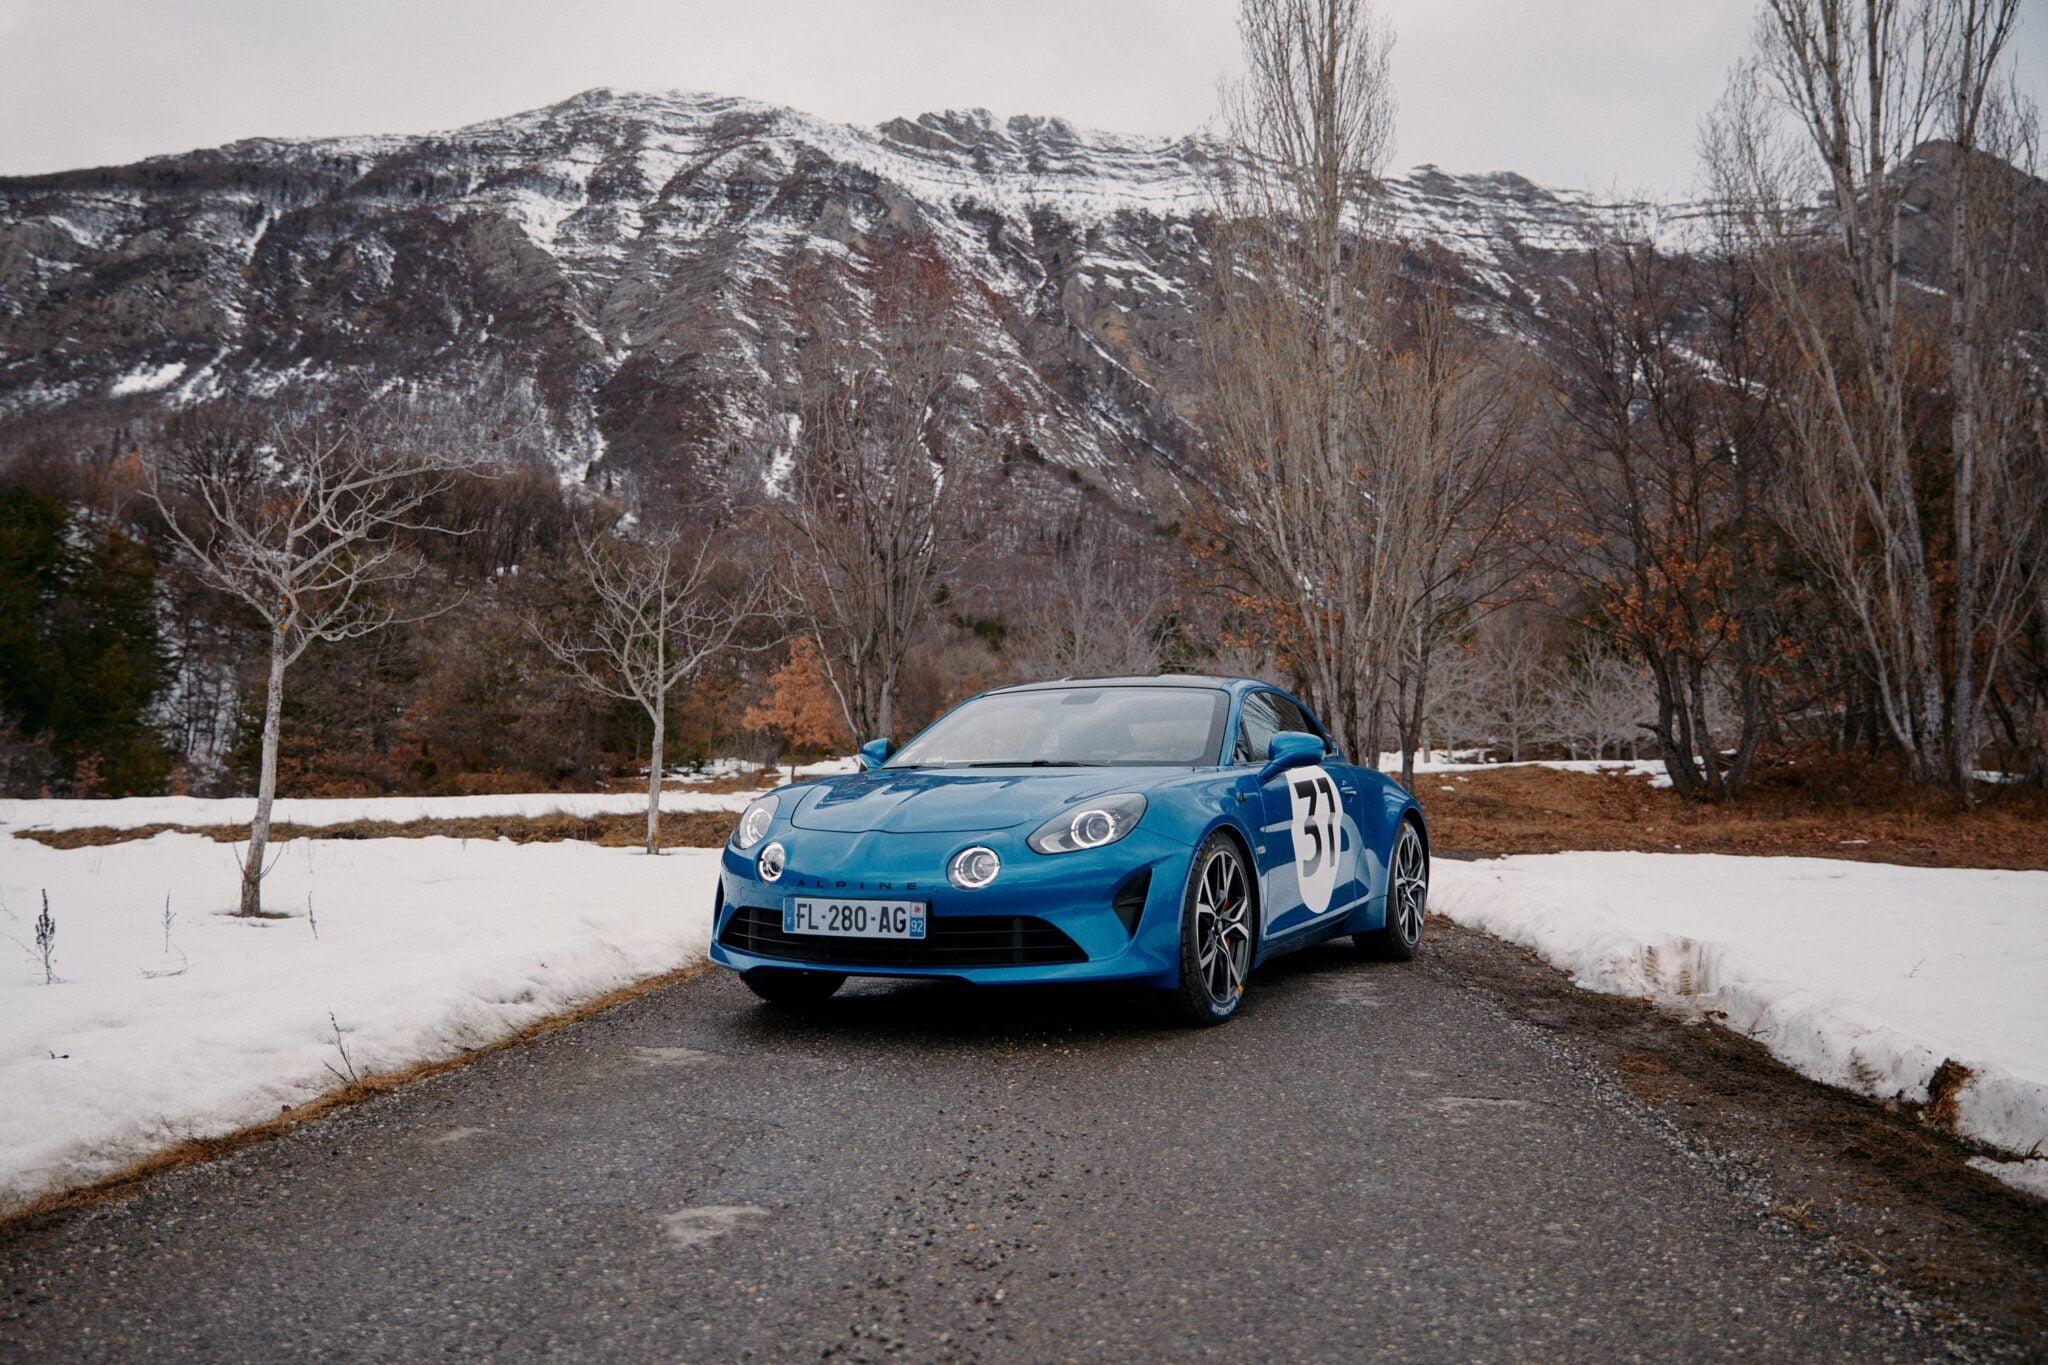 Esteban Ocon et lAlpine A110S assaut du Rallye Monte-Carlo 2021les alpinistes